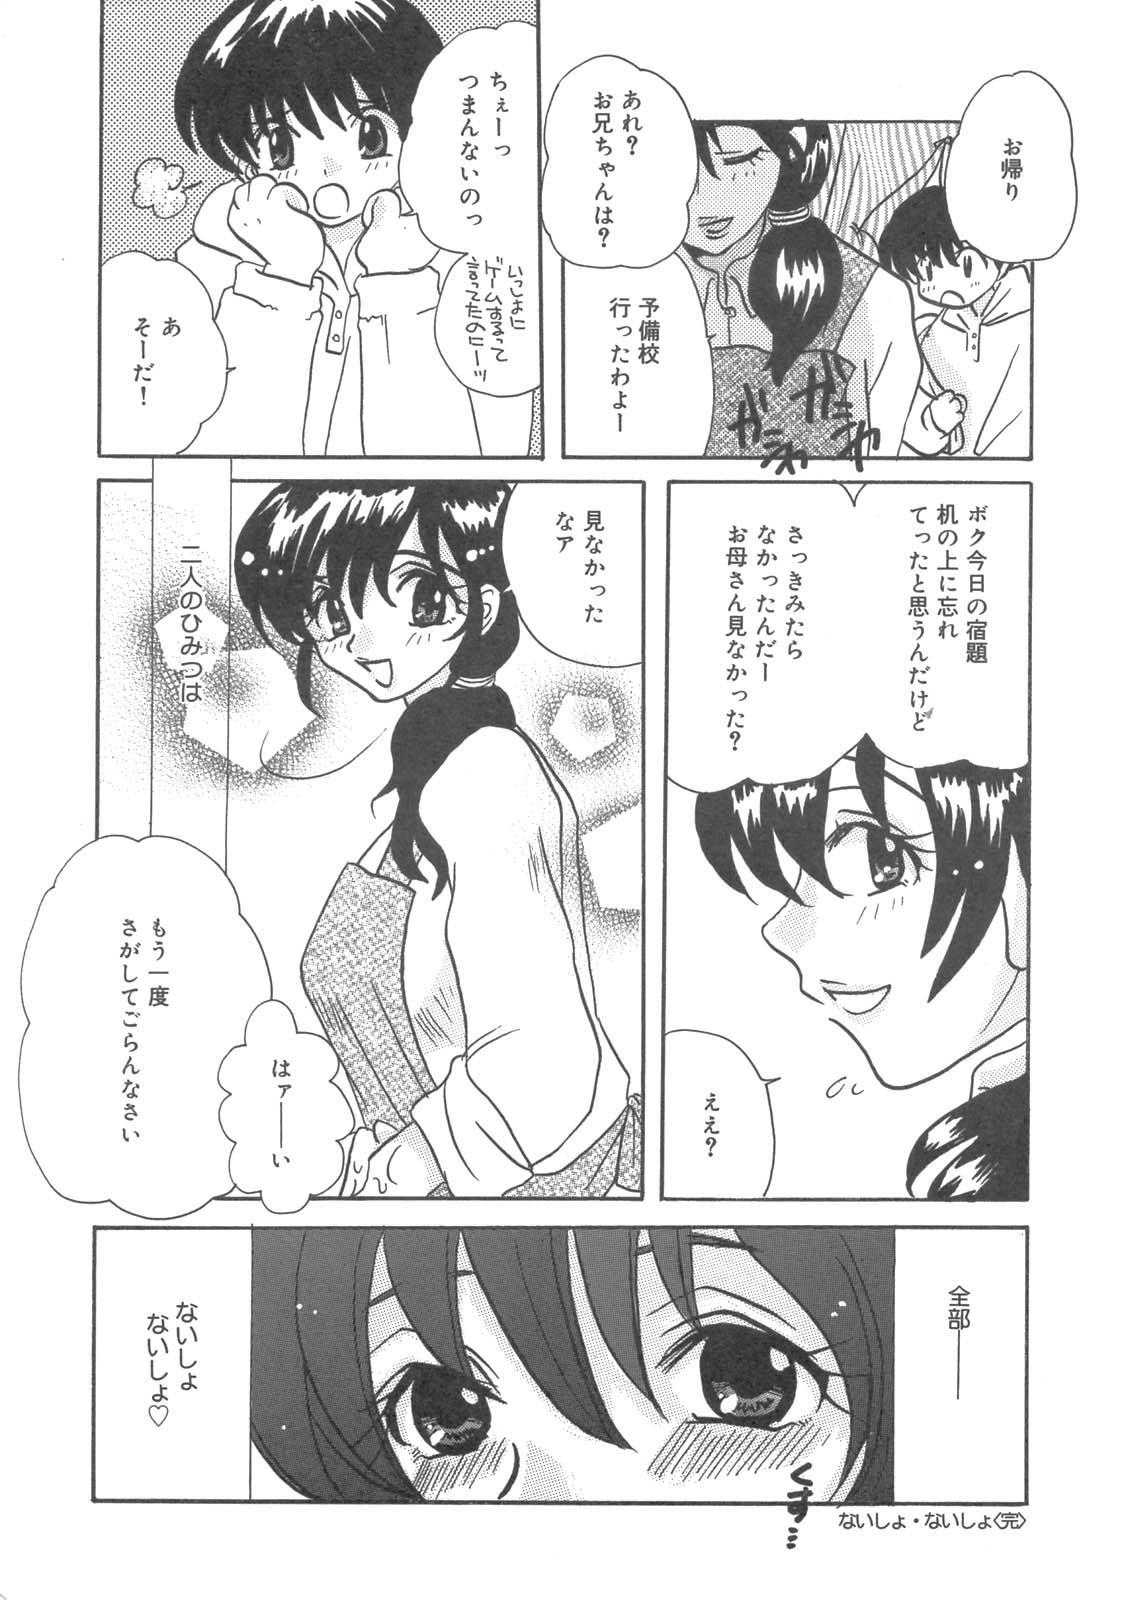 Kanbo Choukyou Sora 144